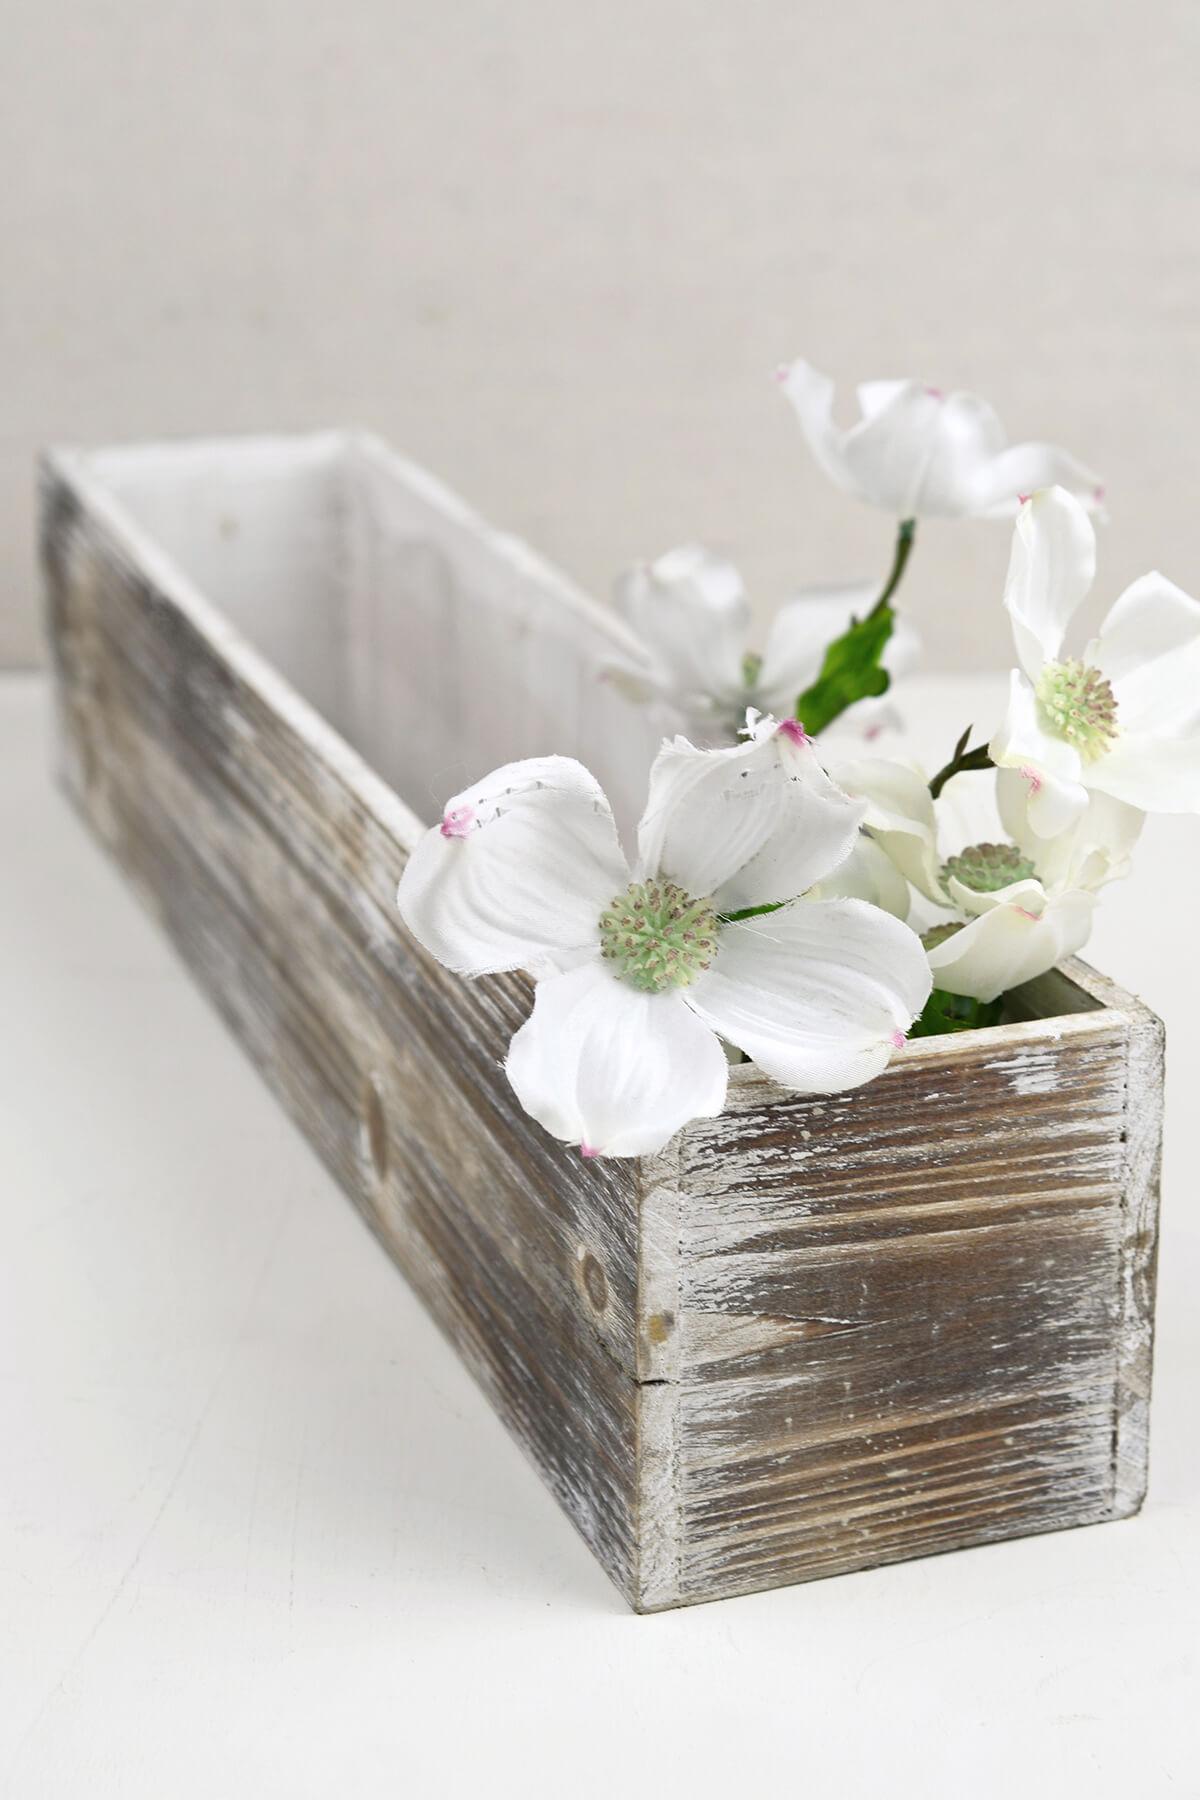 White Washed 4x20 Planter Boxes Wood